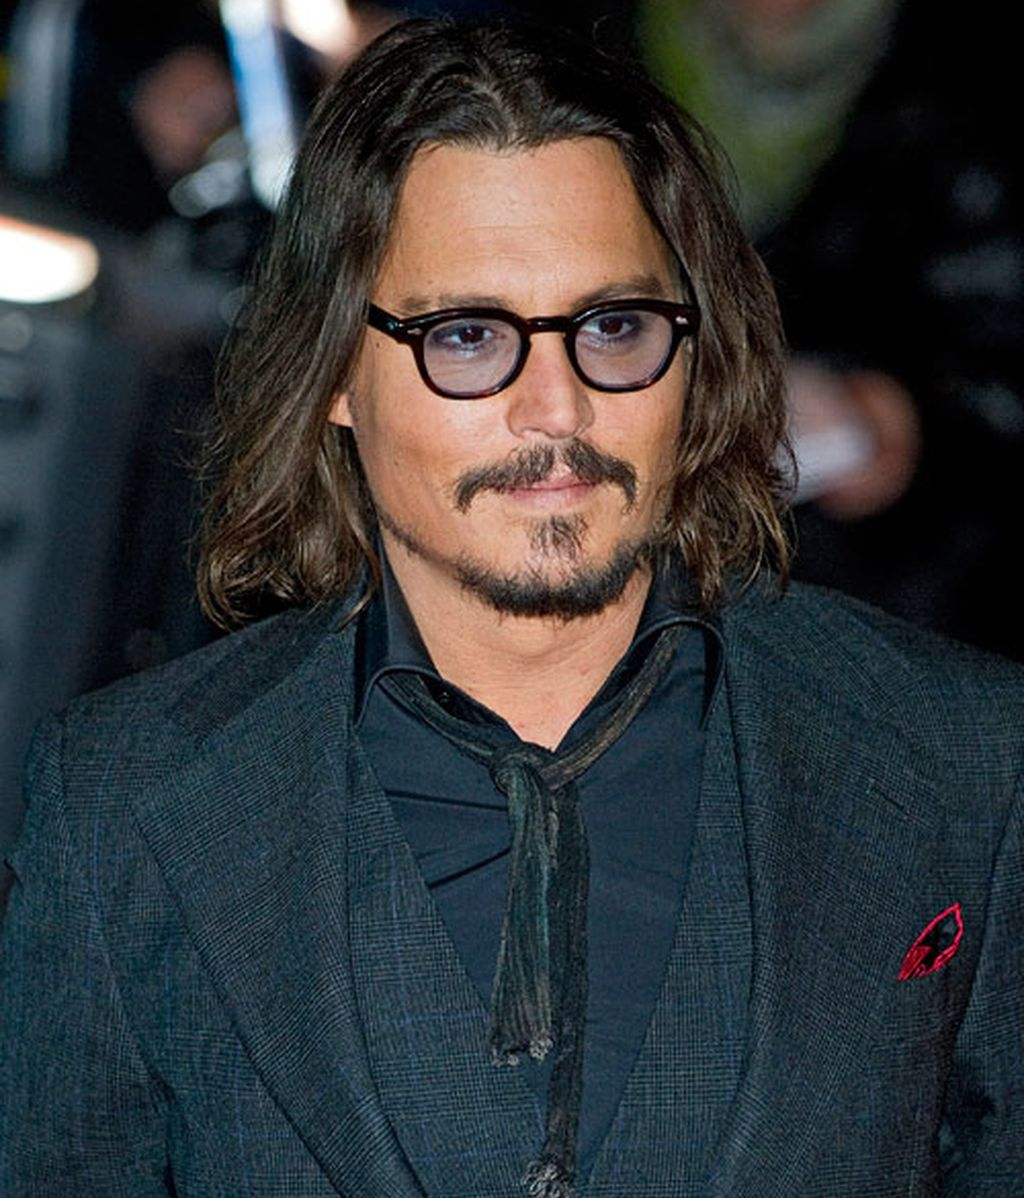 Famosos en masa para ver a Angelina Jolie, Johnny Depp y Brad Pitt